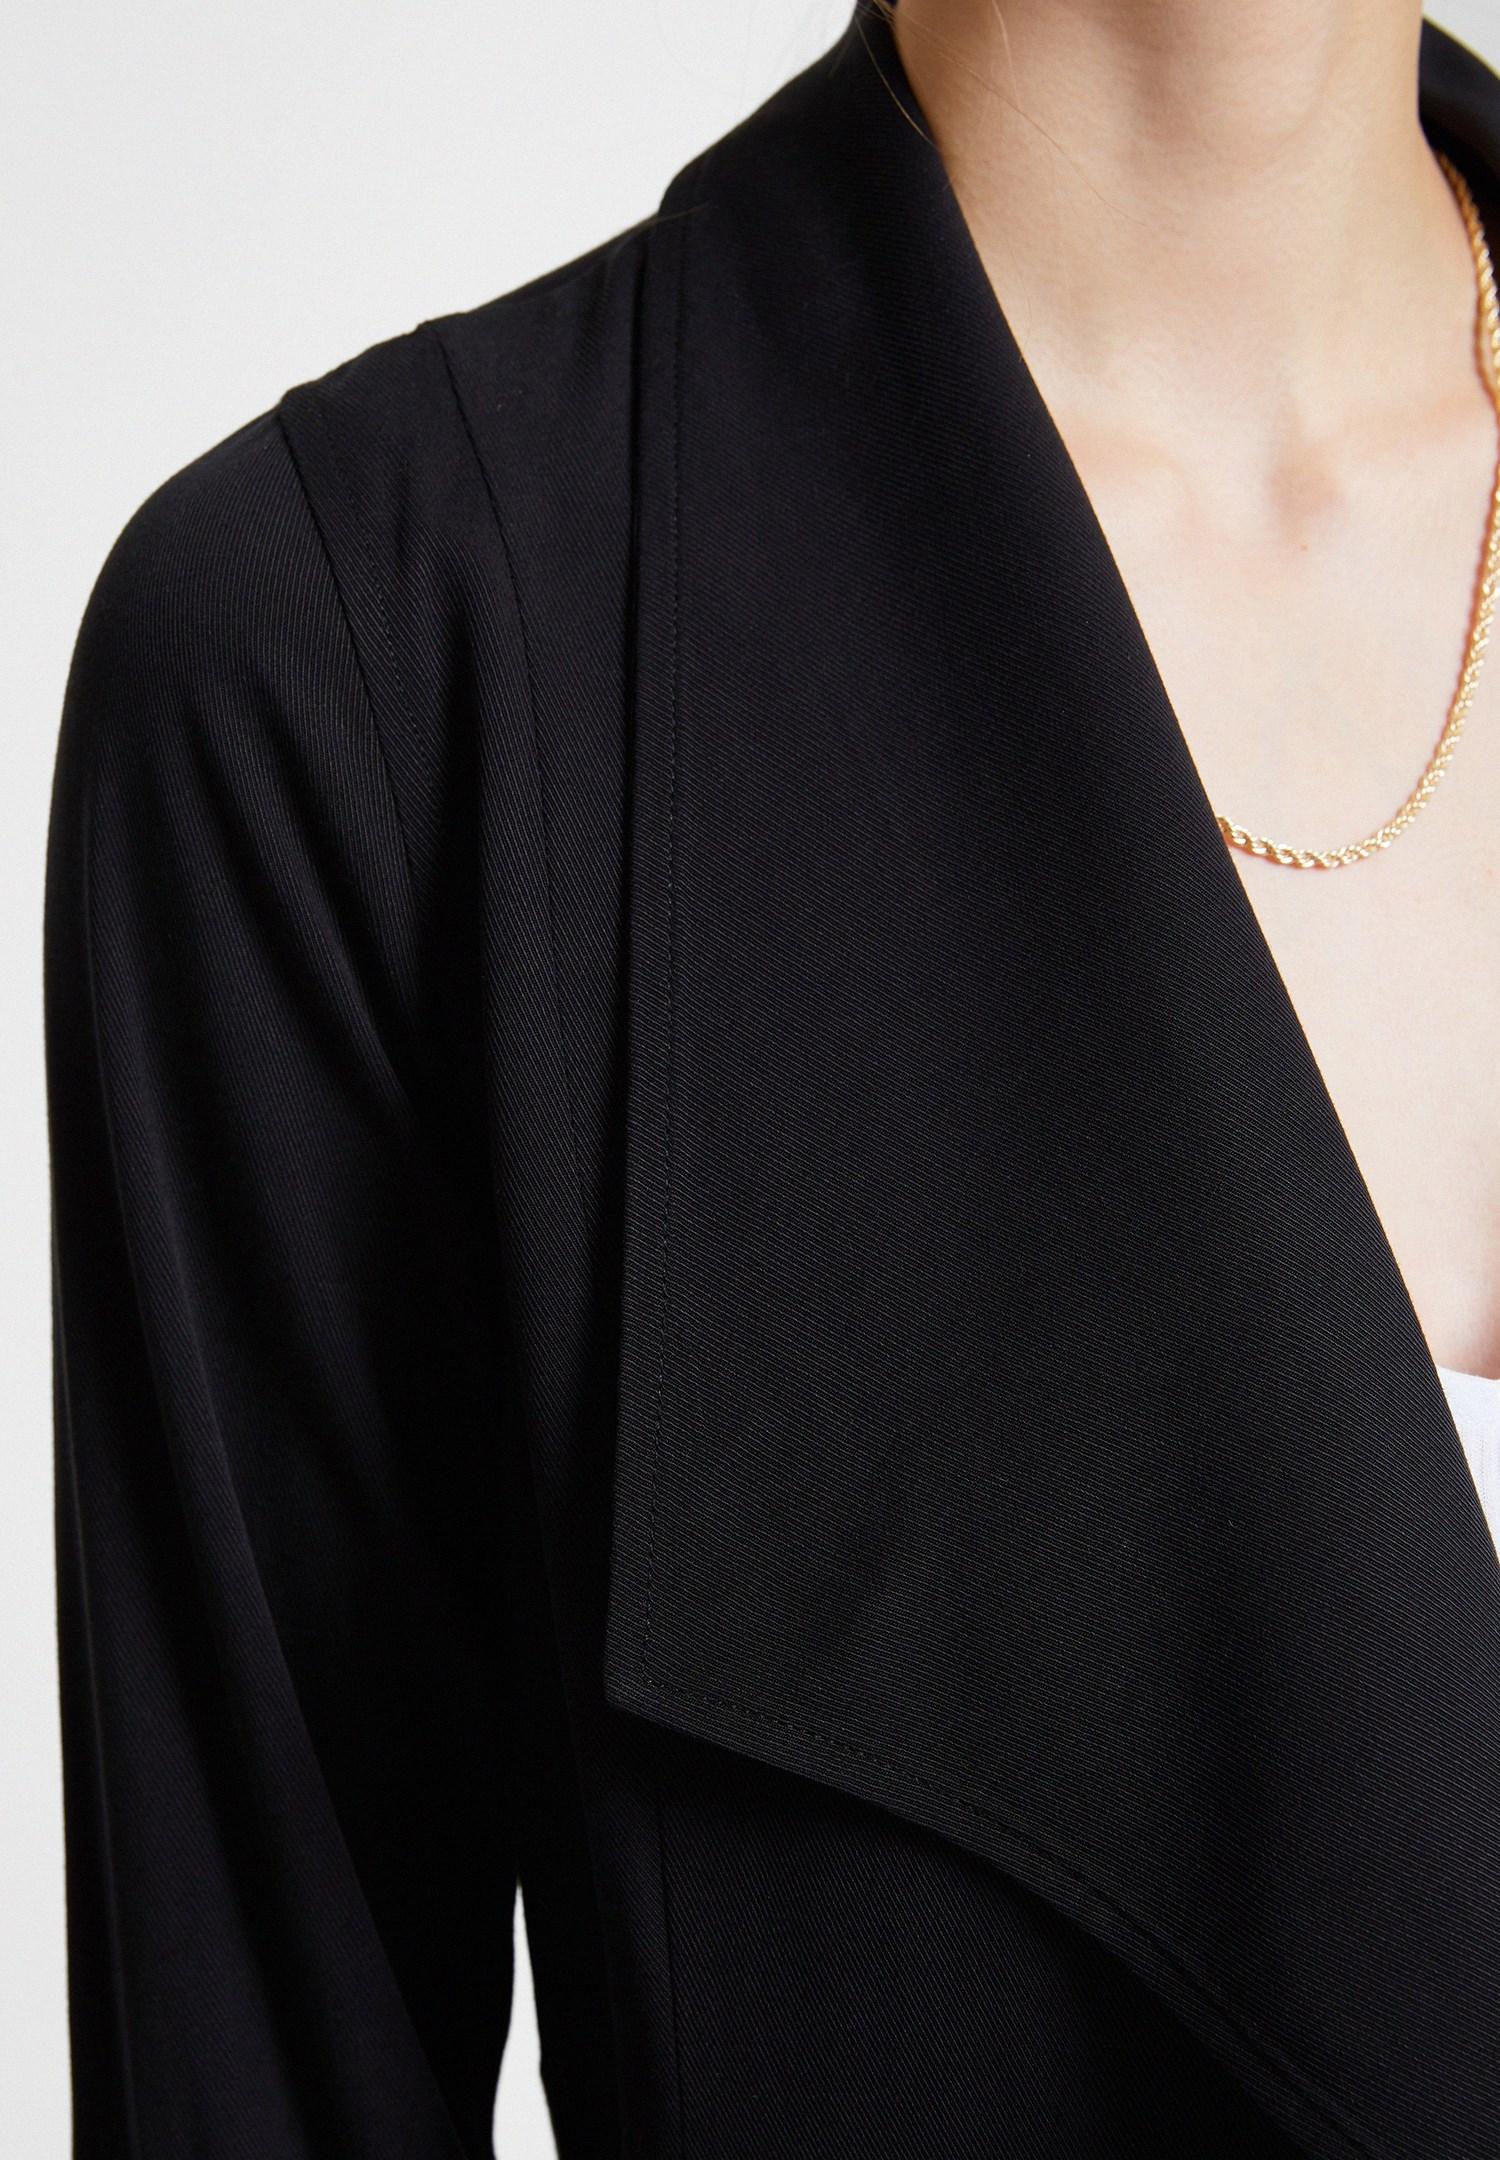 Bayan Siyah Dökümlü Cupro Blazer Ceket